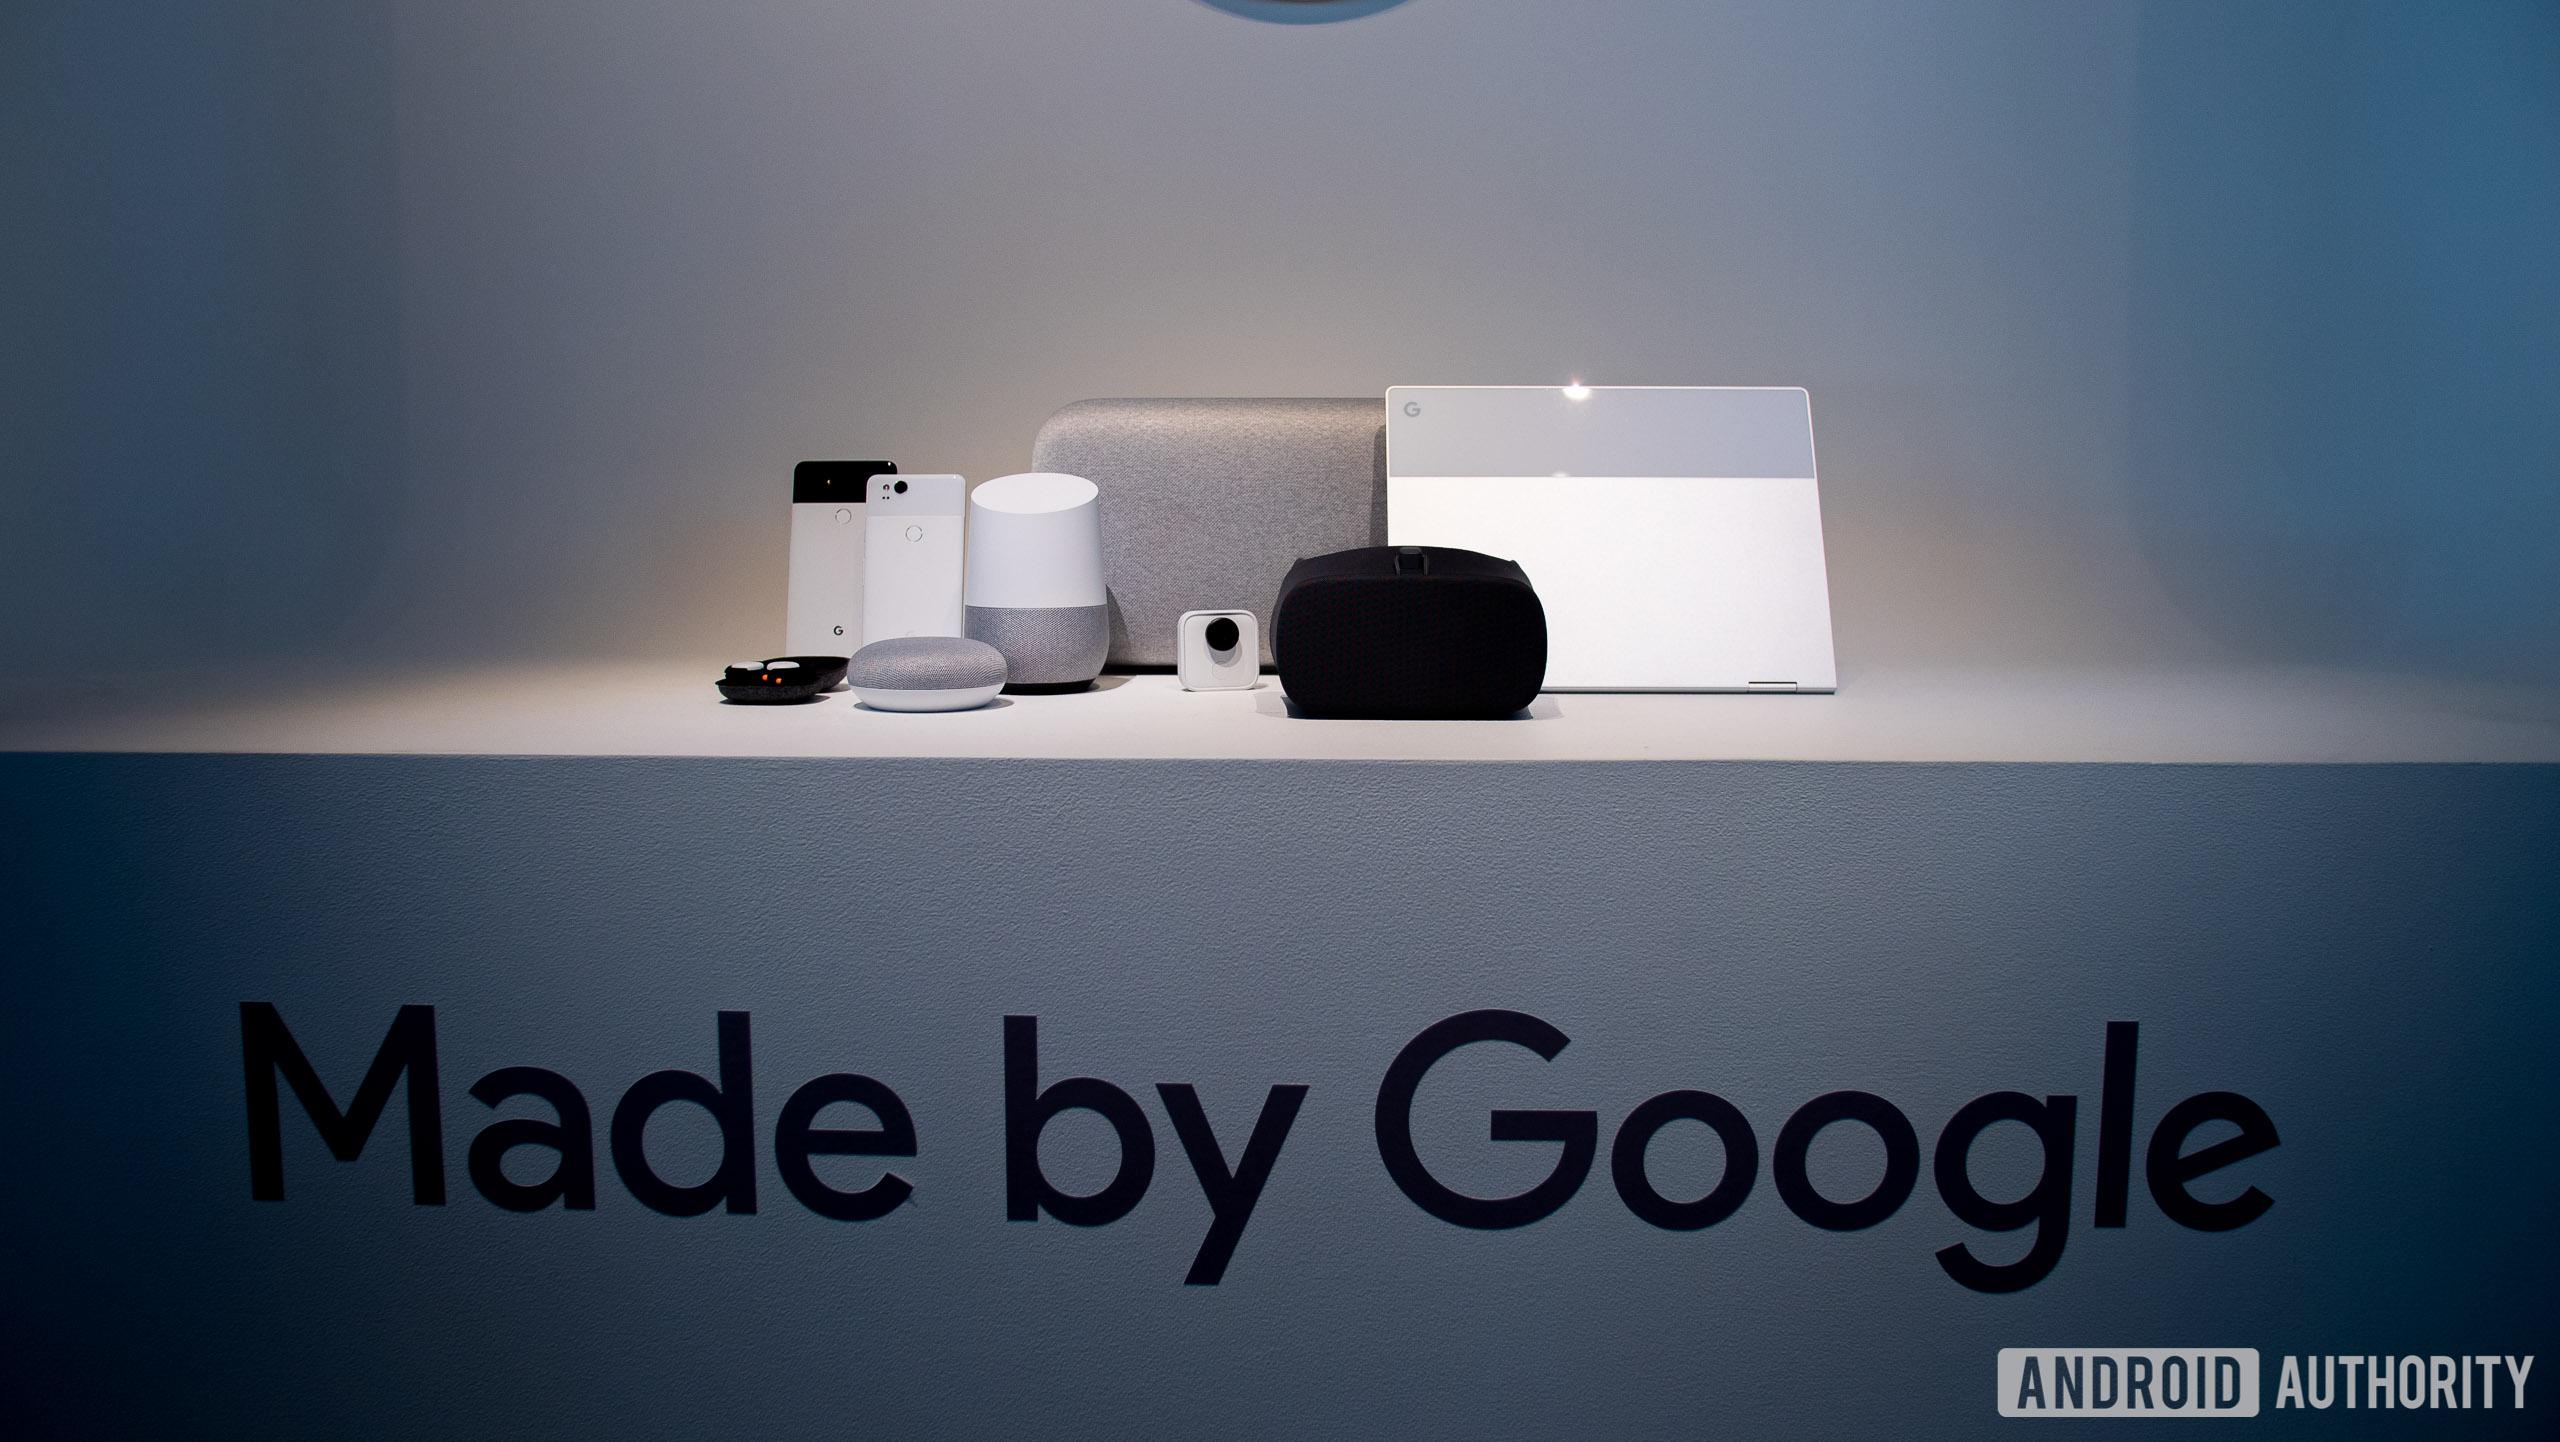 Google estimated to make $2 8 billion from hardware